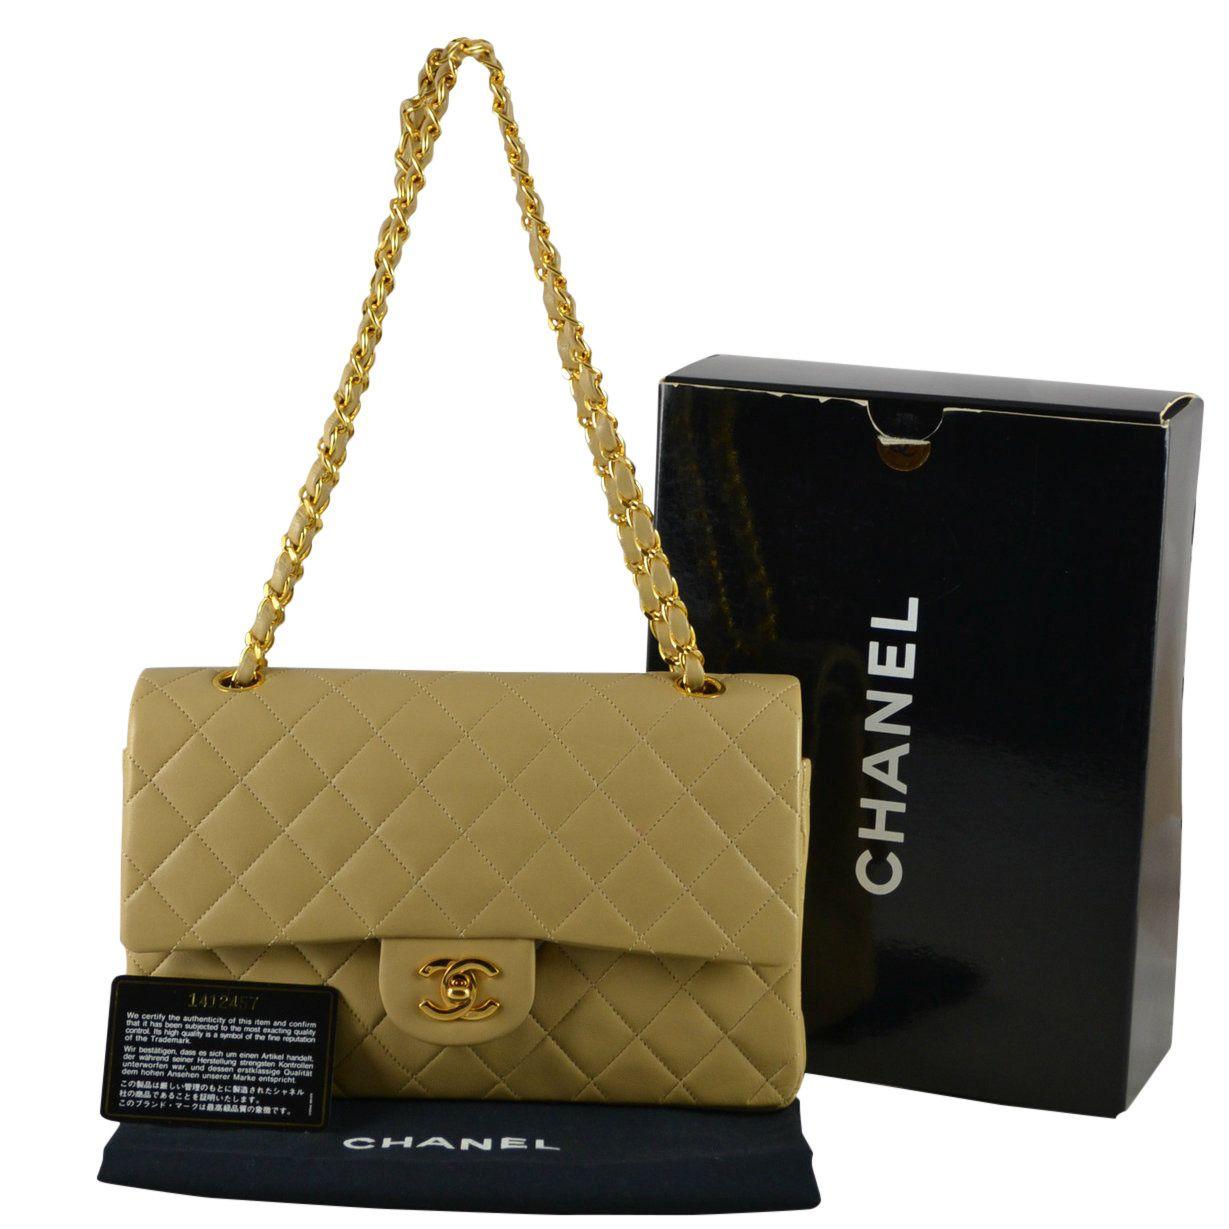 f355792e406e Chanel Nude Lambskin Medium Classic Flap Bag (SL) - Keeks Buy + Sell  Designer…